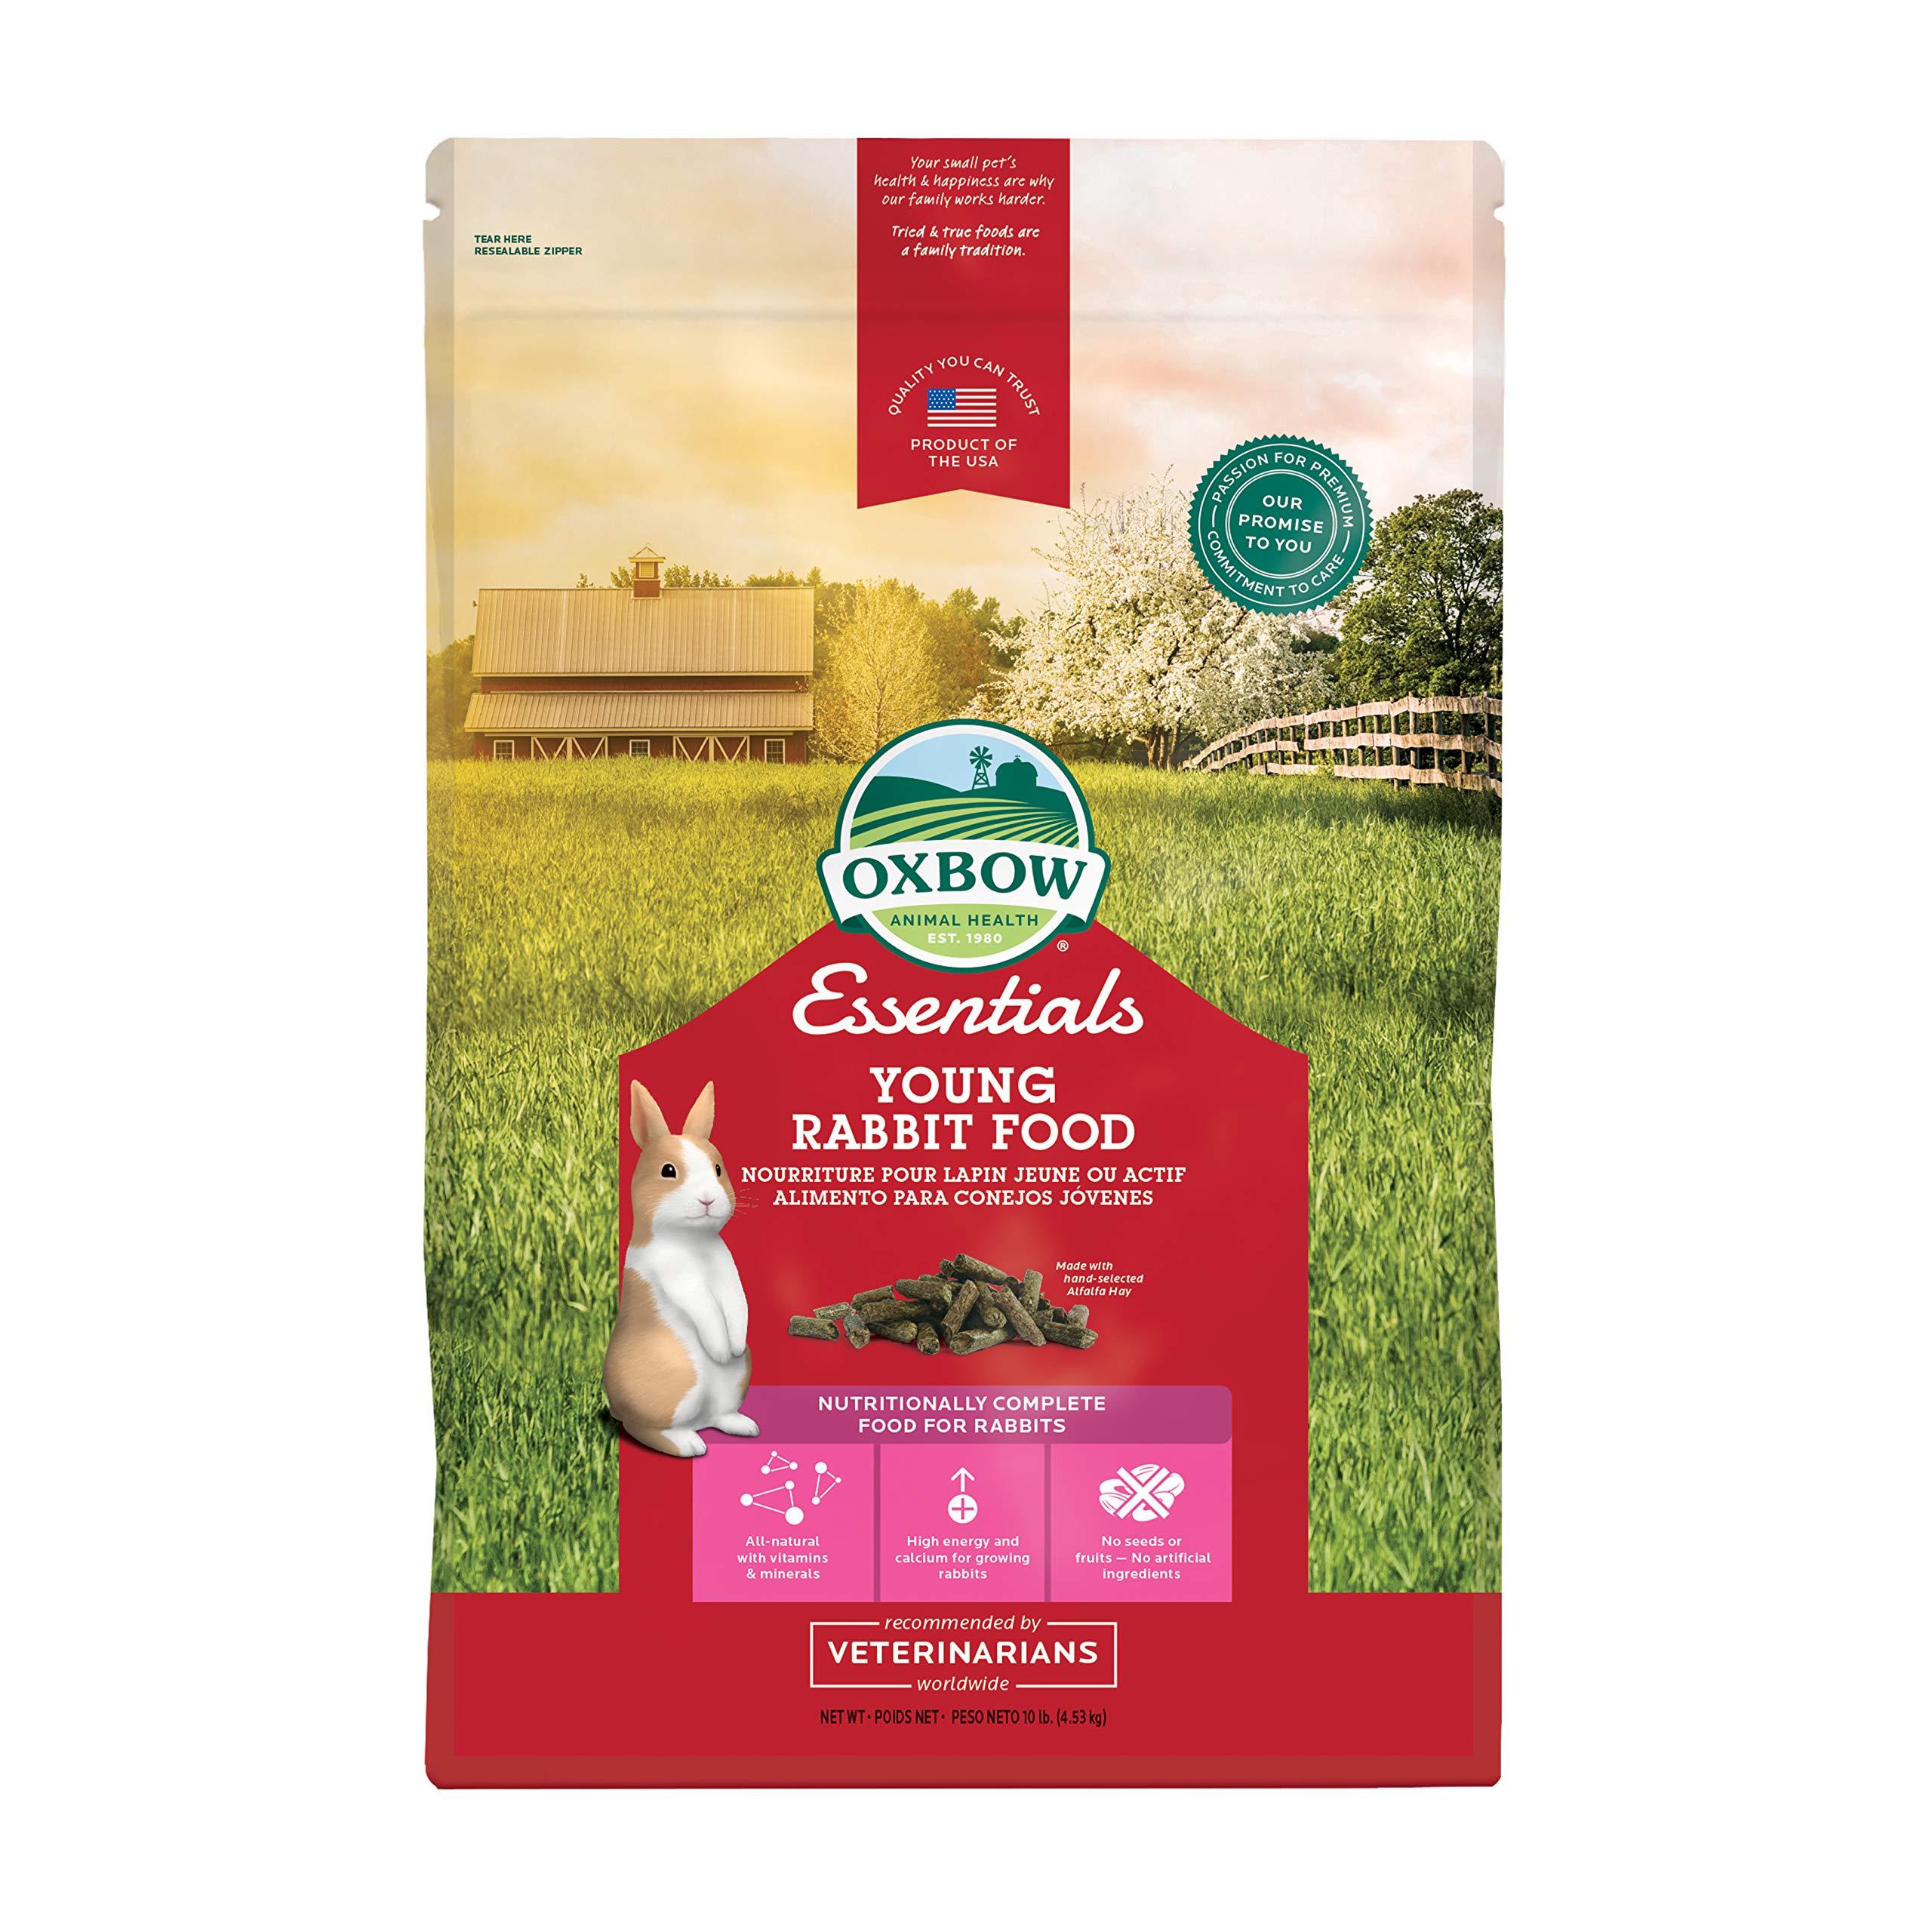 Oxbow Essentials Bunny Basics - Young Rabbit Food - Alfalfa Hay - 10 Lbs by Oxbow